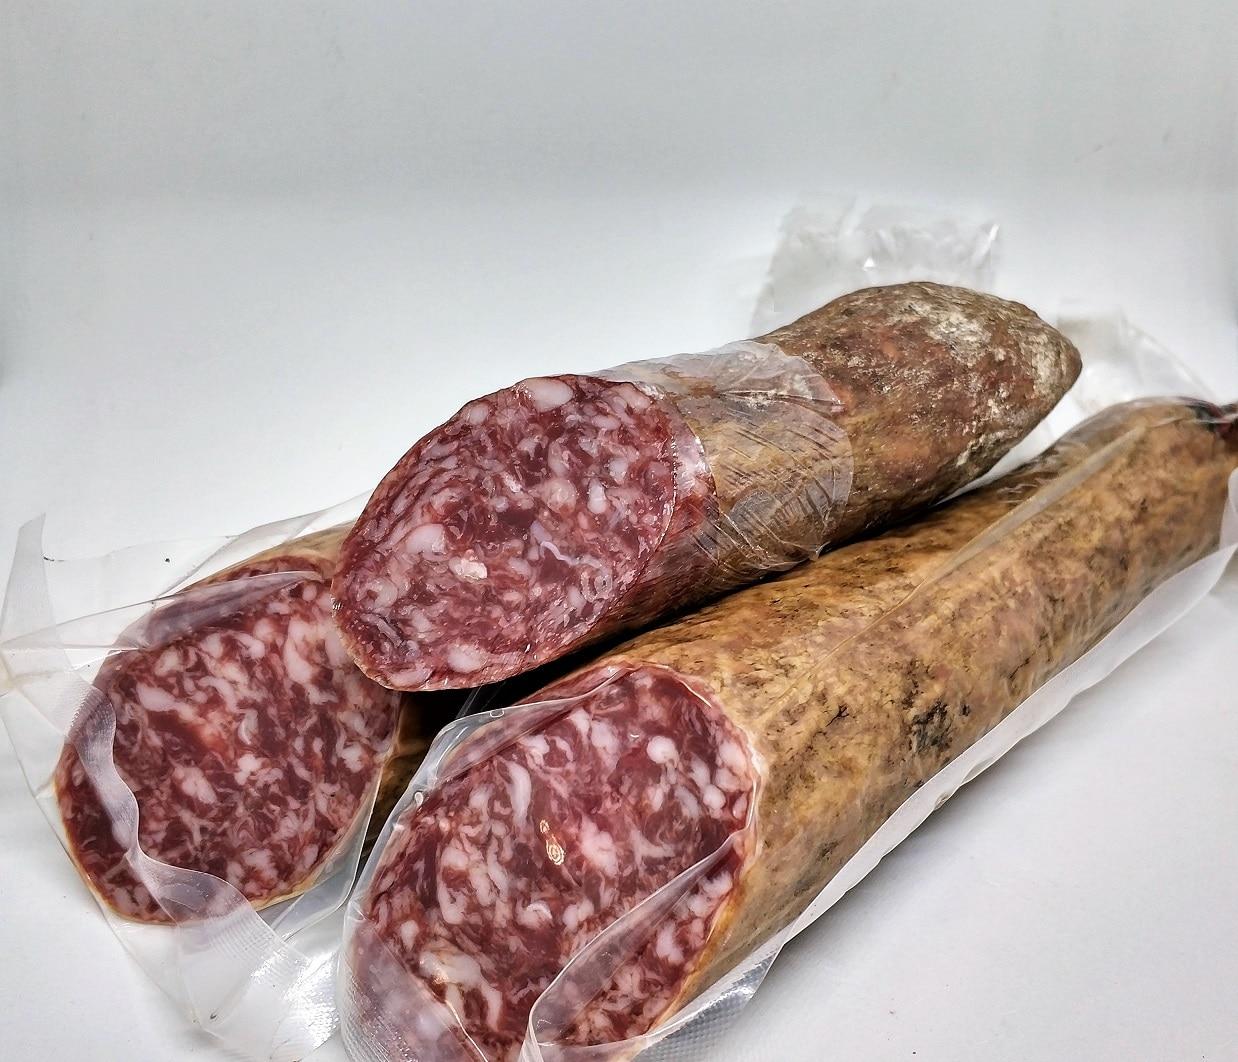 salchichon-cular-iberico-de-bellota